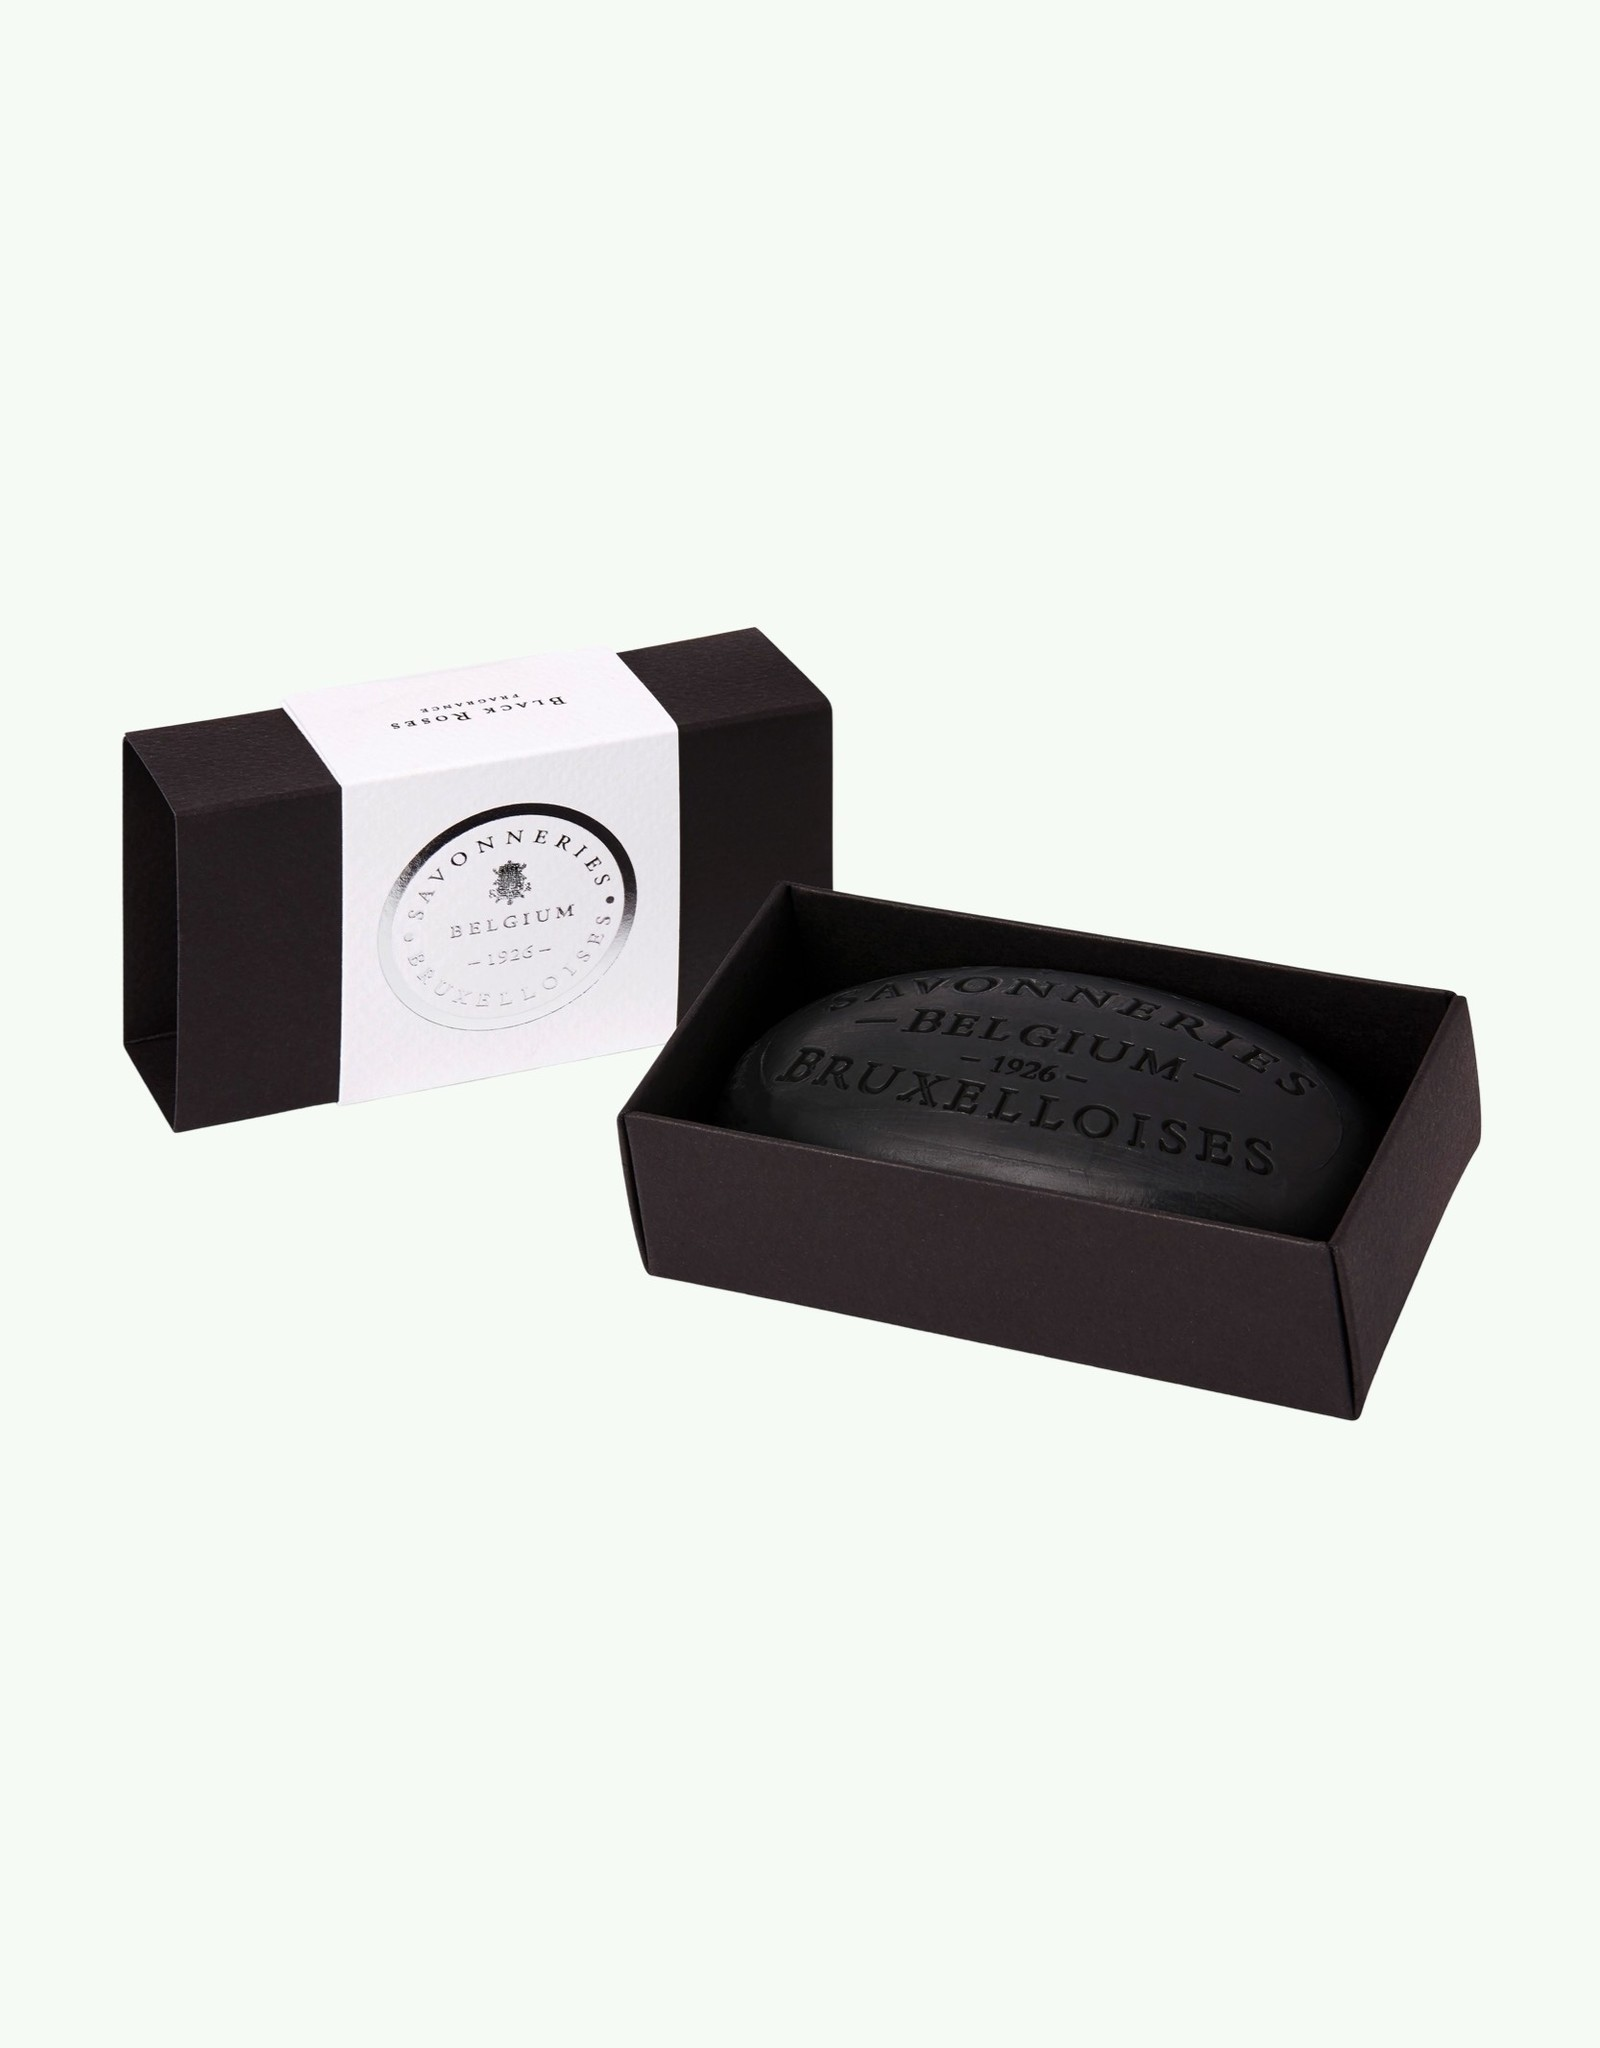 Savonneries Bruxelloises Savonneries Bruxelloises - Black Roses - Soap